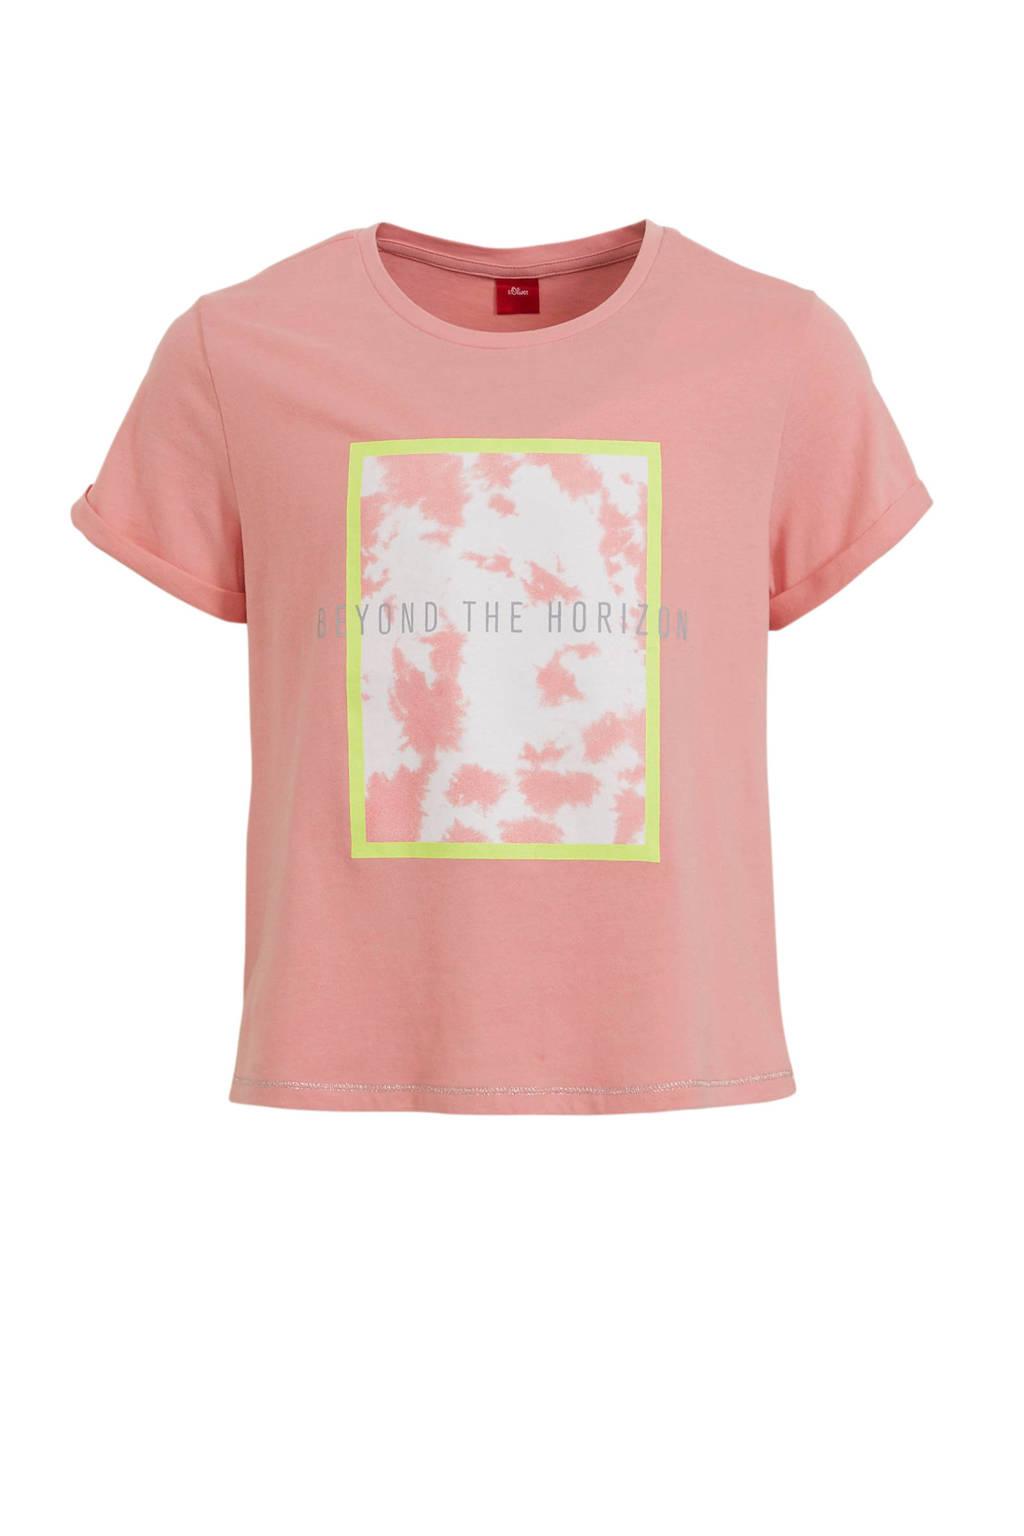 s.Oliver T-shirt met printopdruk lichtroze/lichtgeel/wit, Lichtroze/lichtgeel/wit